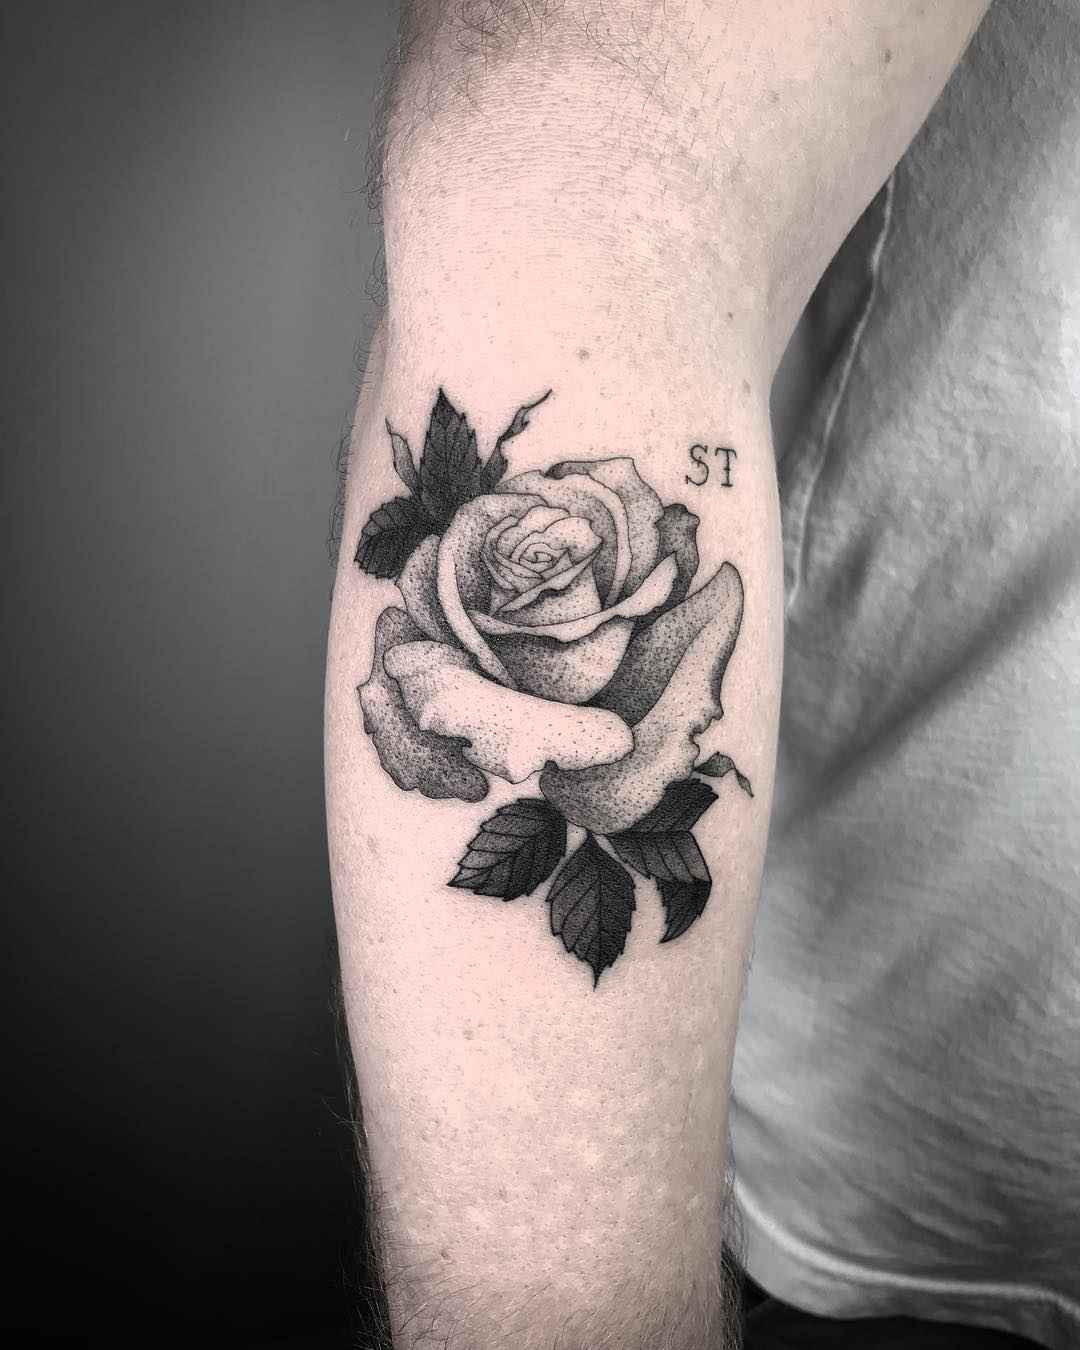 Tattoo artist nathan kostechko los angeles usa inkppl for Tattoo supply los angeles